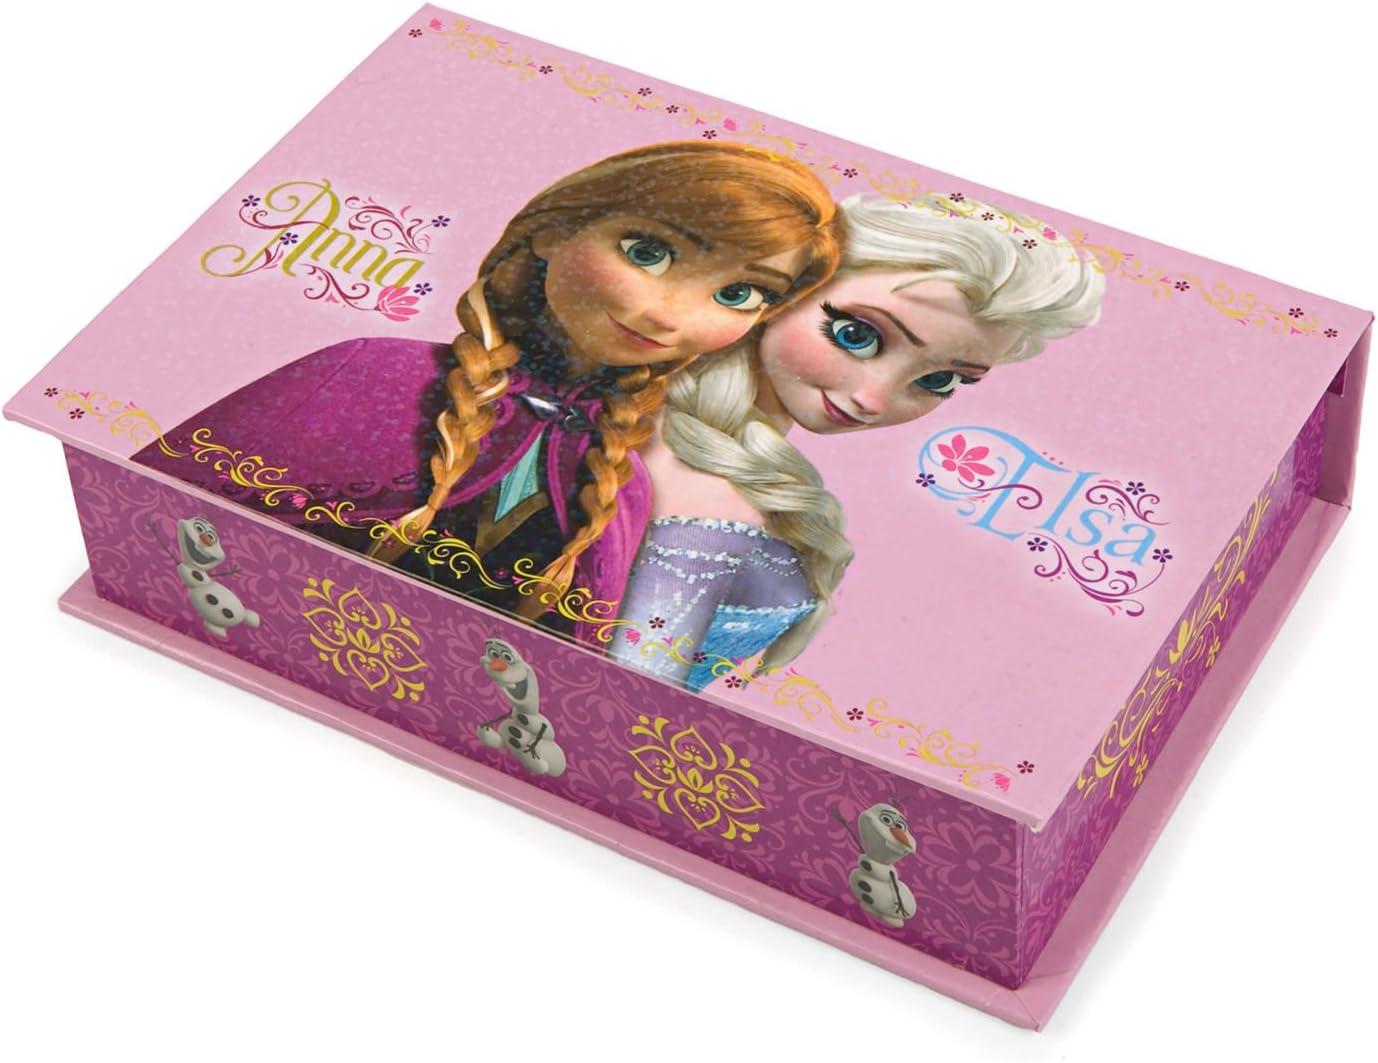 Toy Zany Disney Frozen Elsa and Anna Let it Go Theme Song Caja de ...